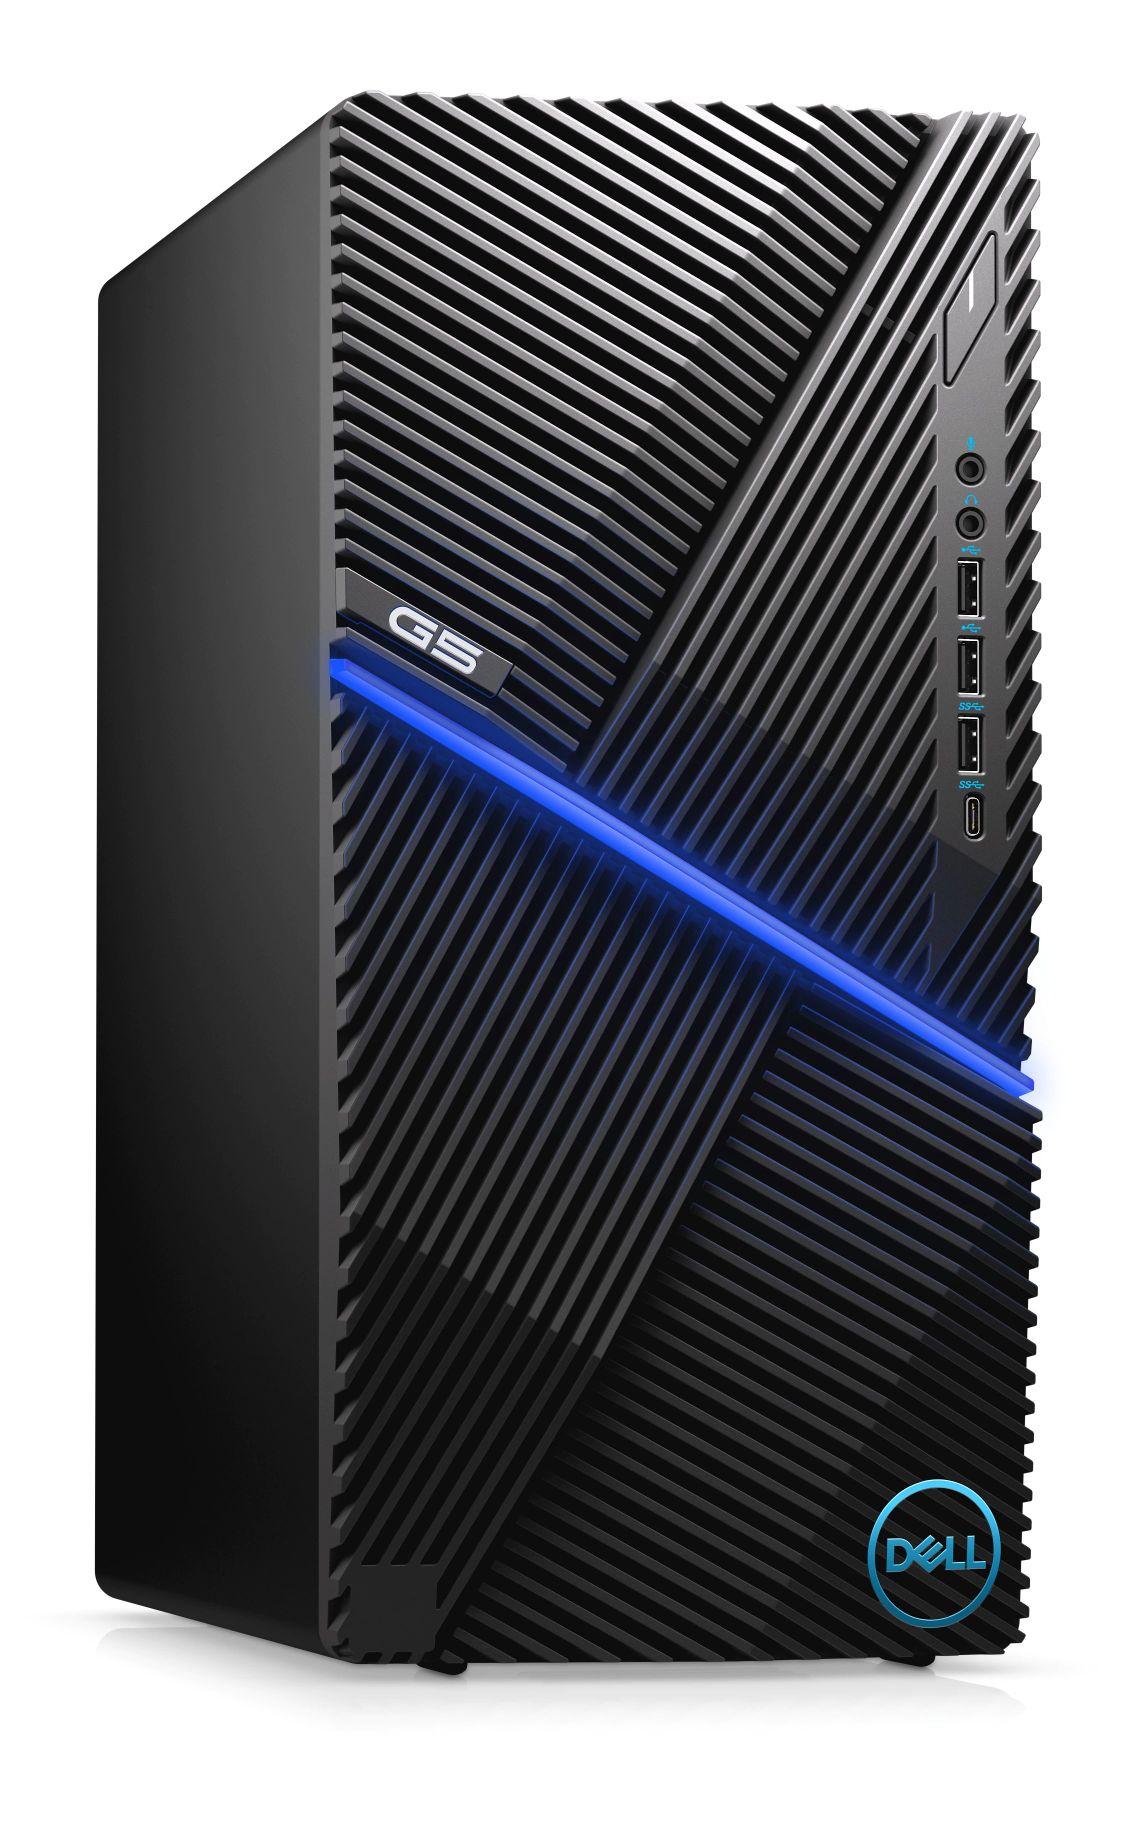 Dell desktop - RTX 3070 - i7-10700F